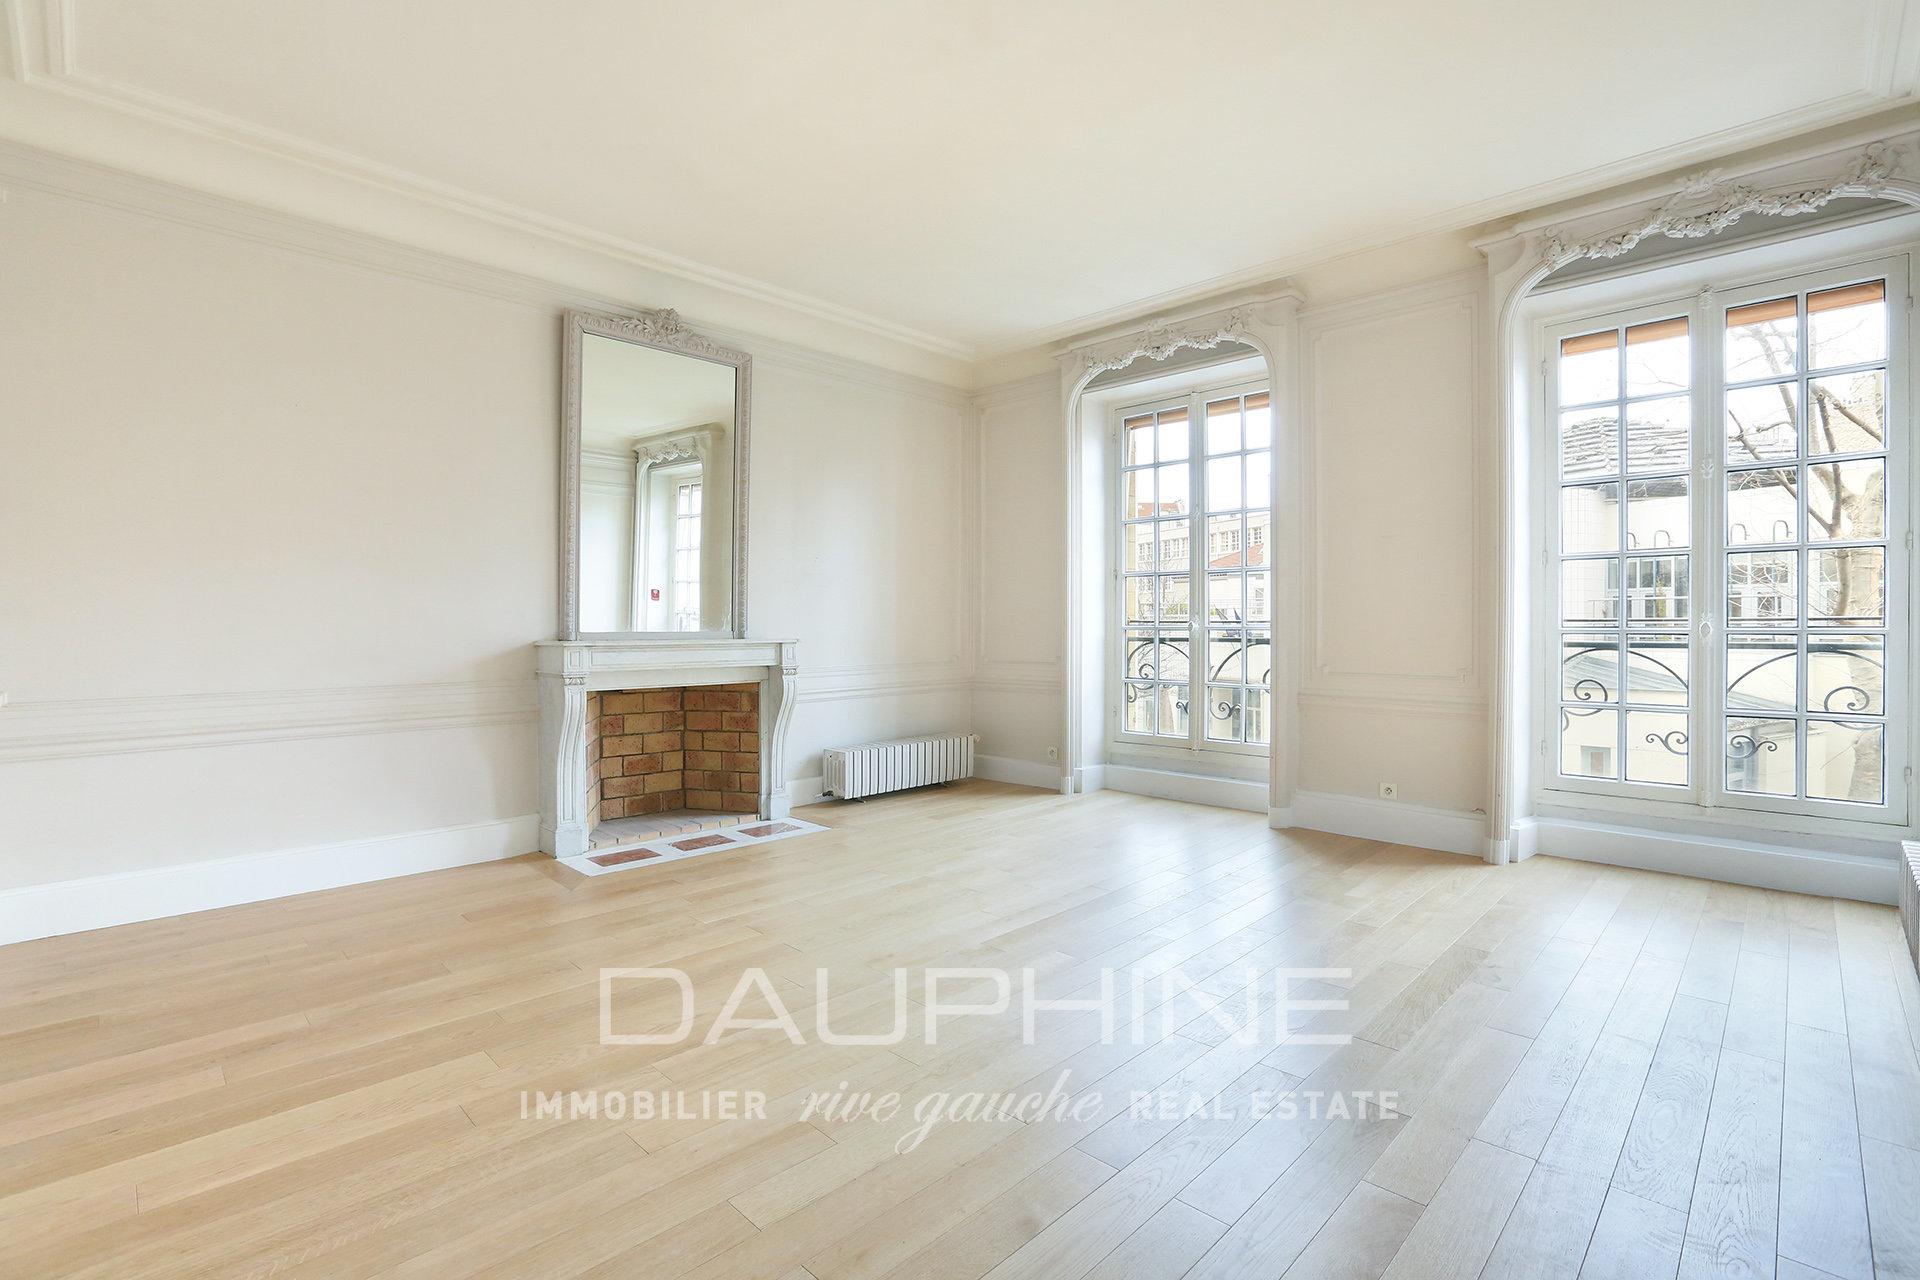 VENTE-3706464-DAUPHINE-RIVE-GAUCHE-PARIS-7e-Paris